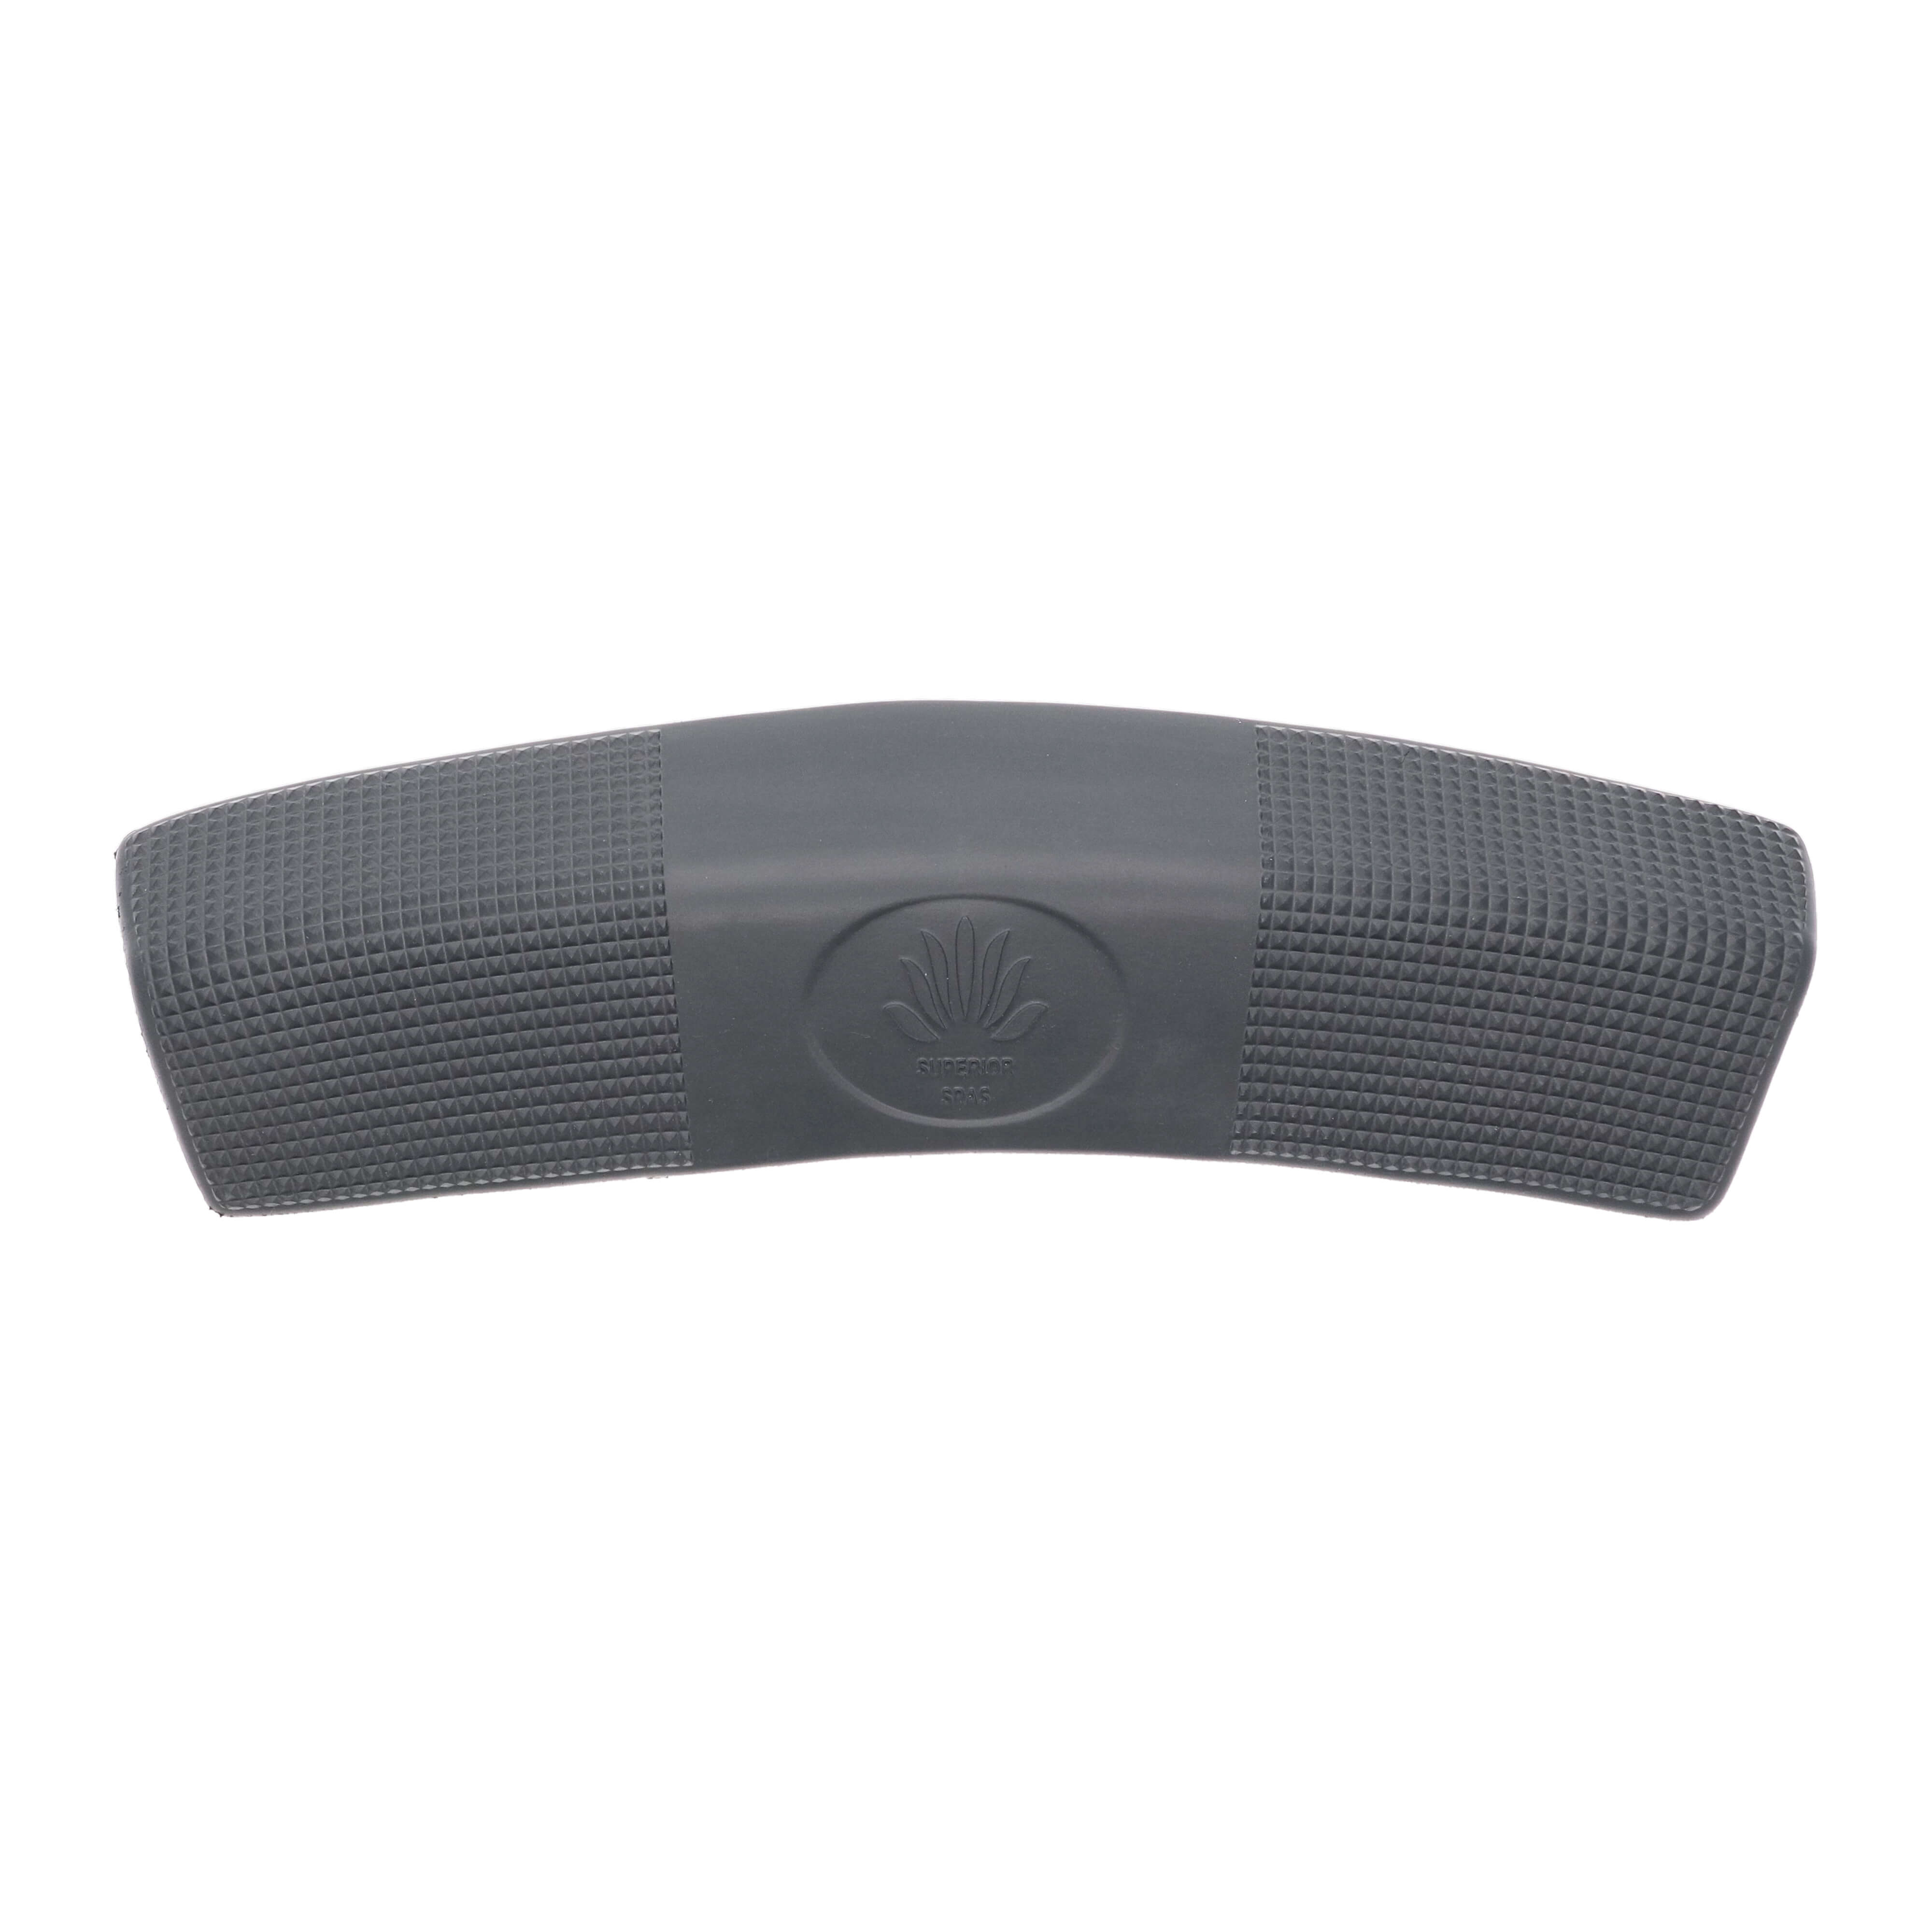 SUP-001 Superior Spas Headrest